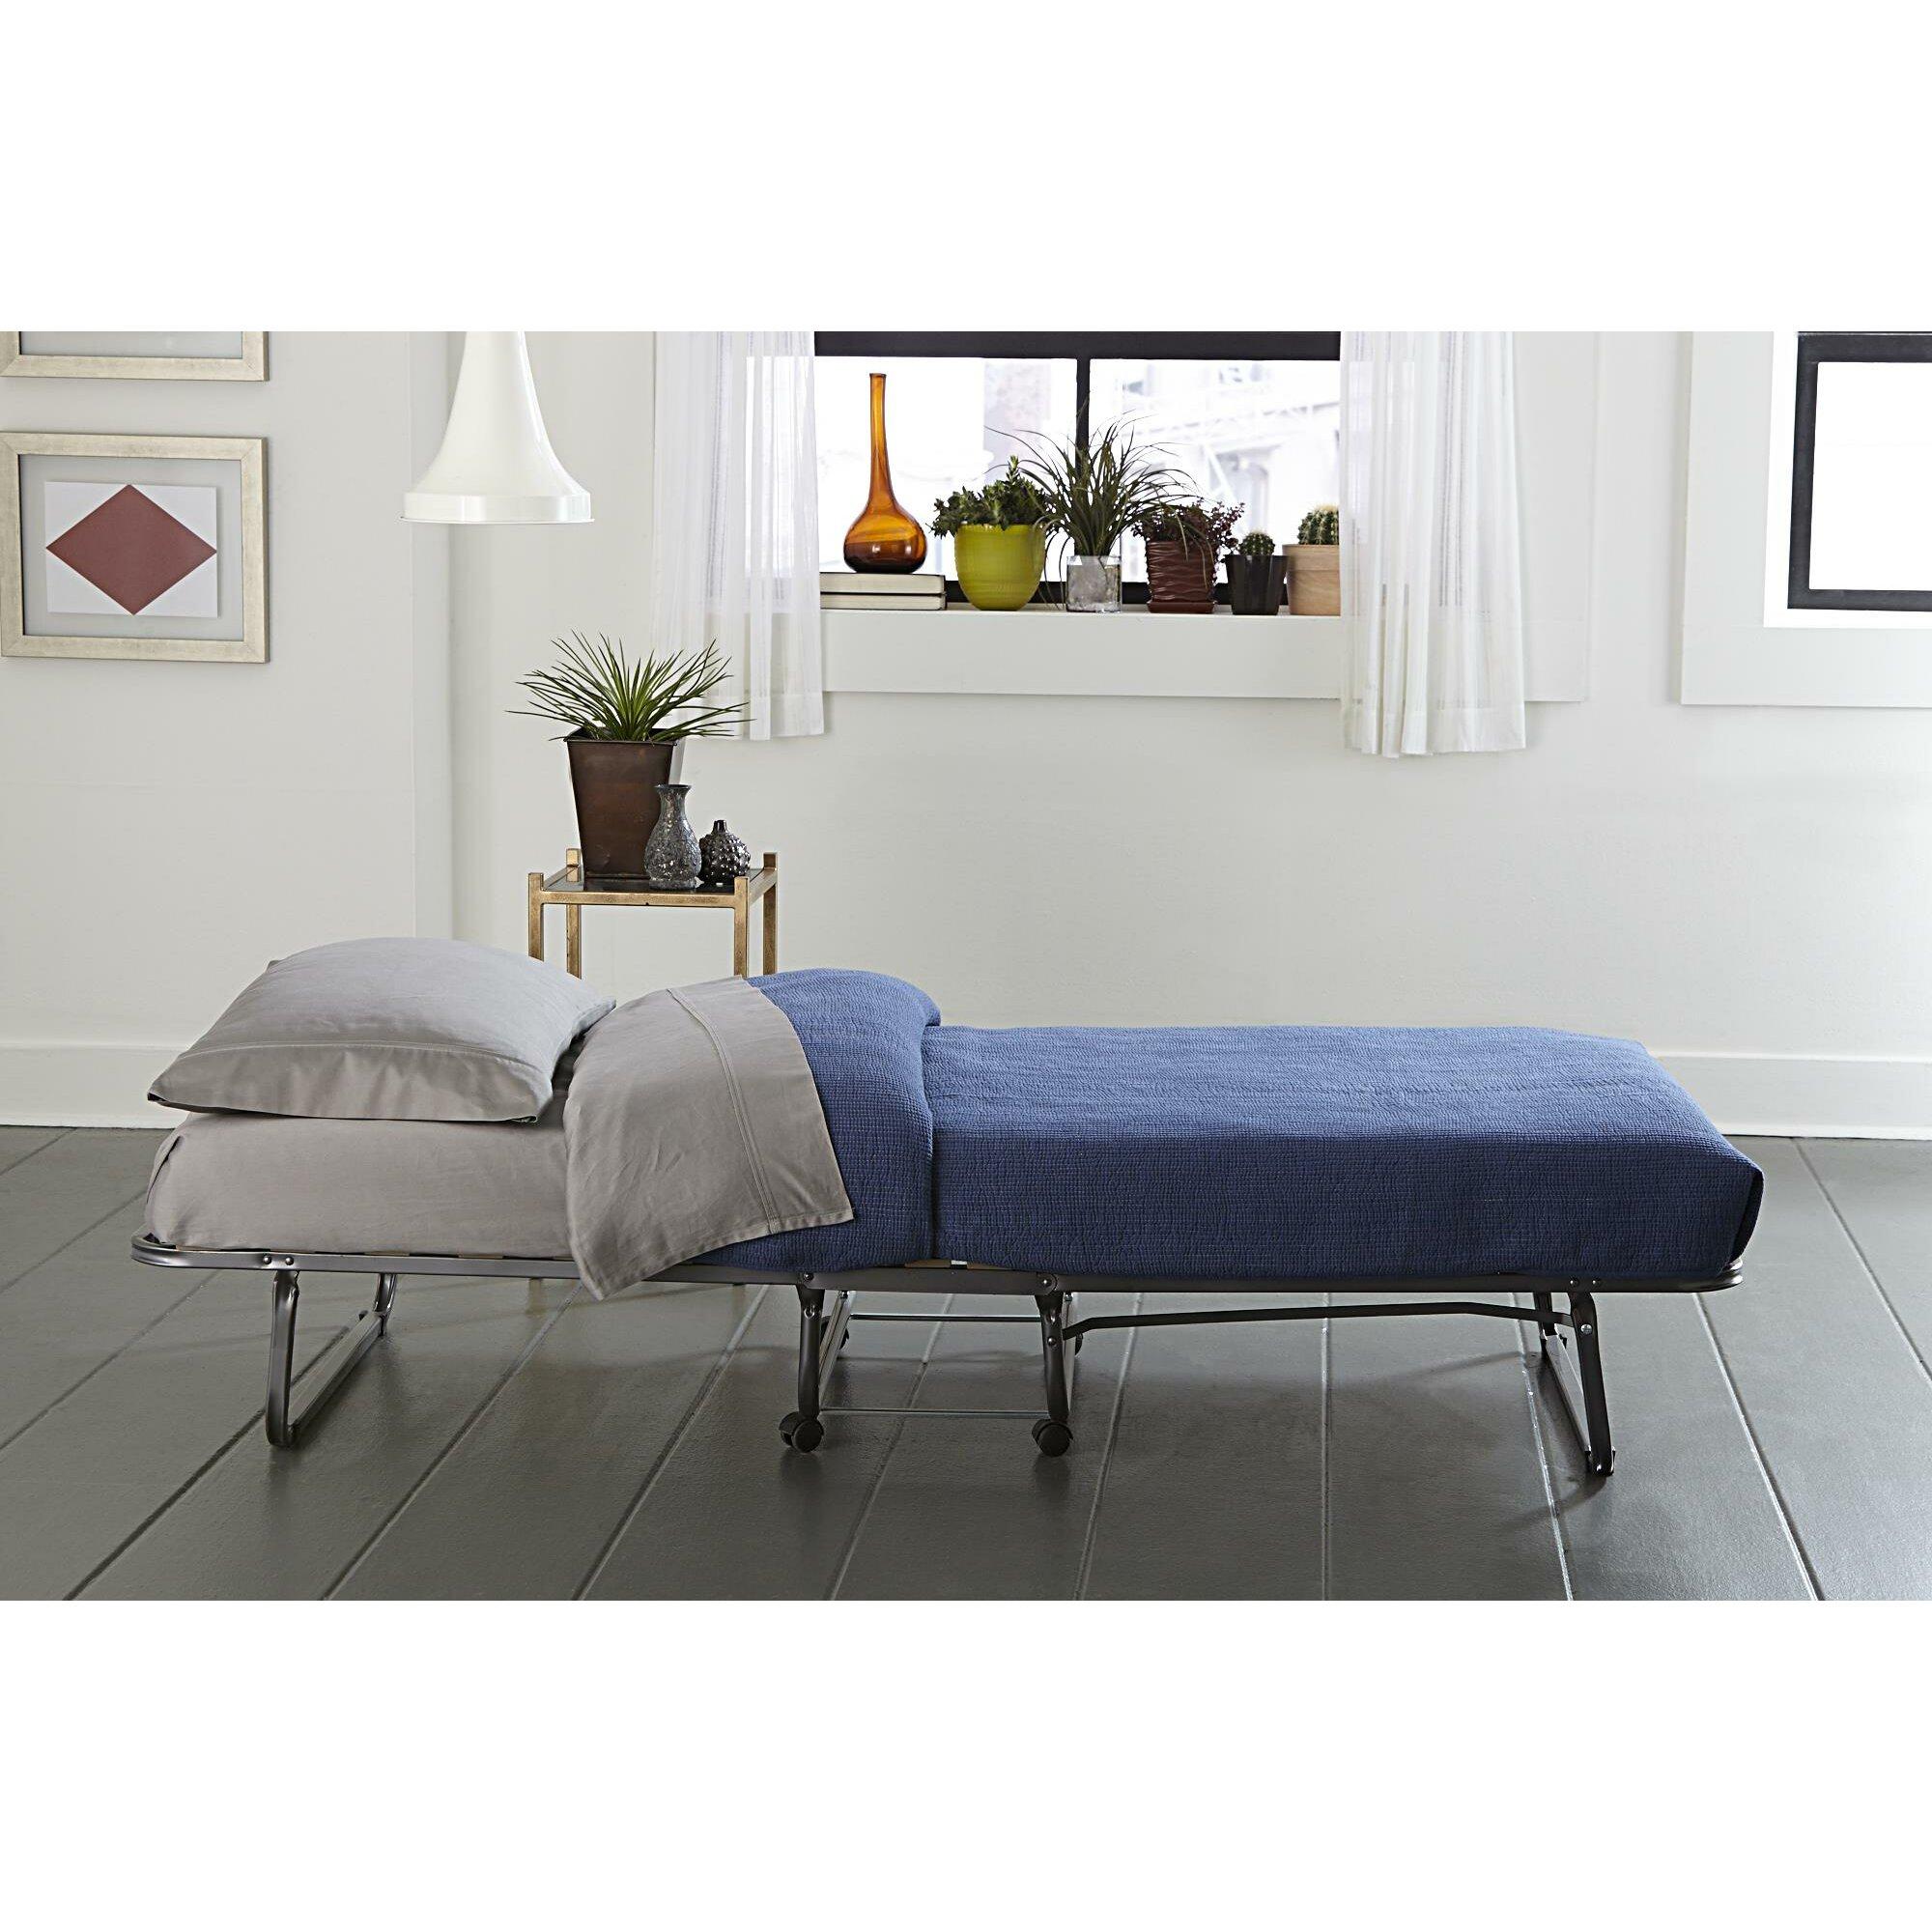 Folding Beds Reviews : Symple stuff folding bed reviews wayfair